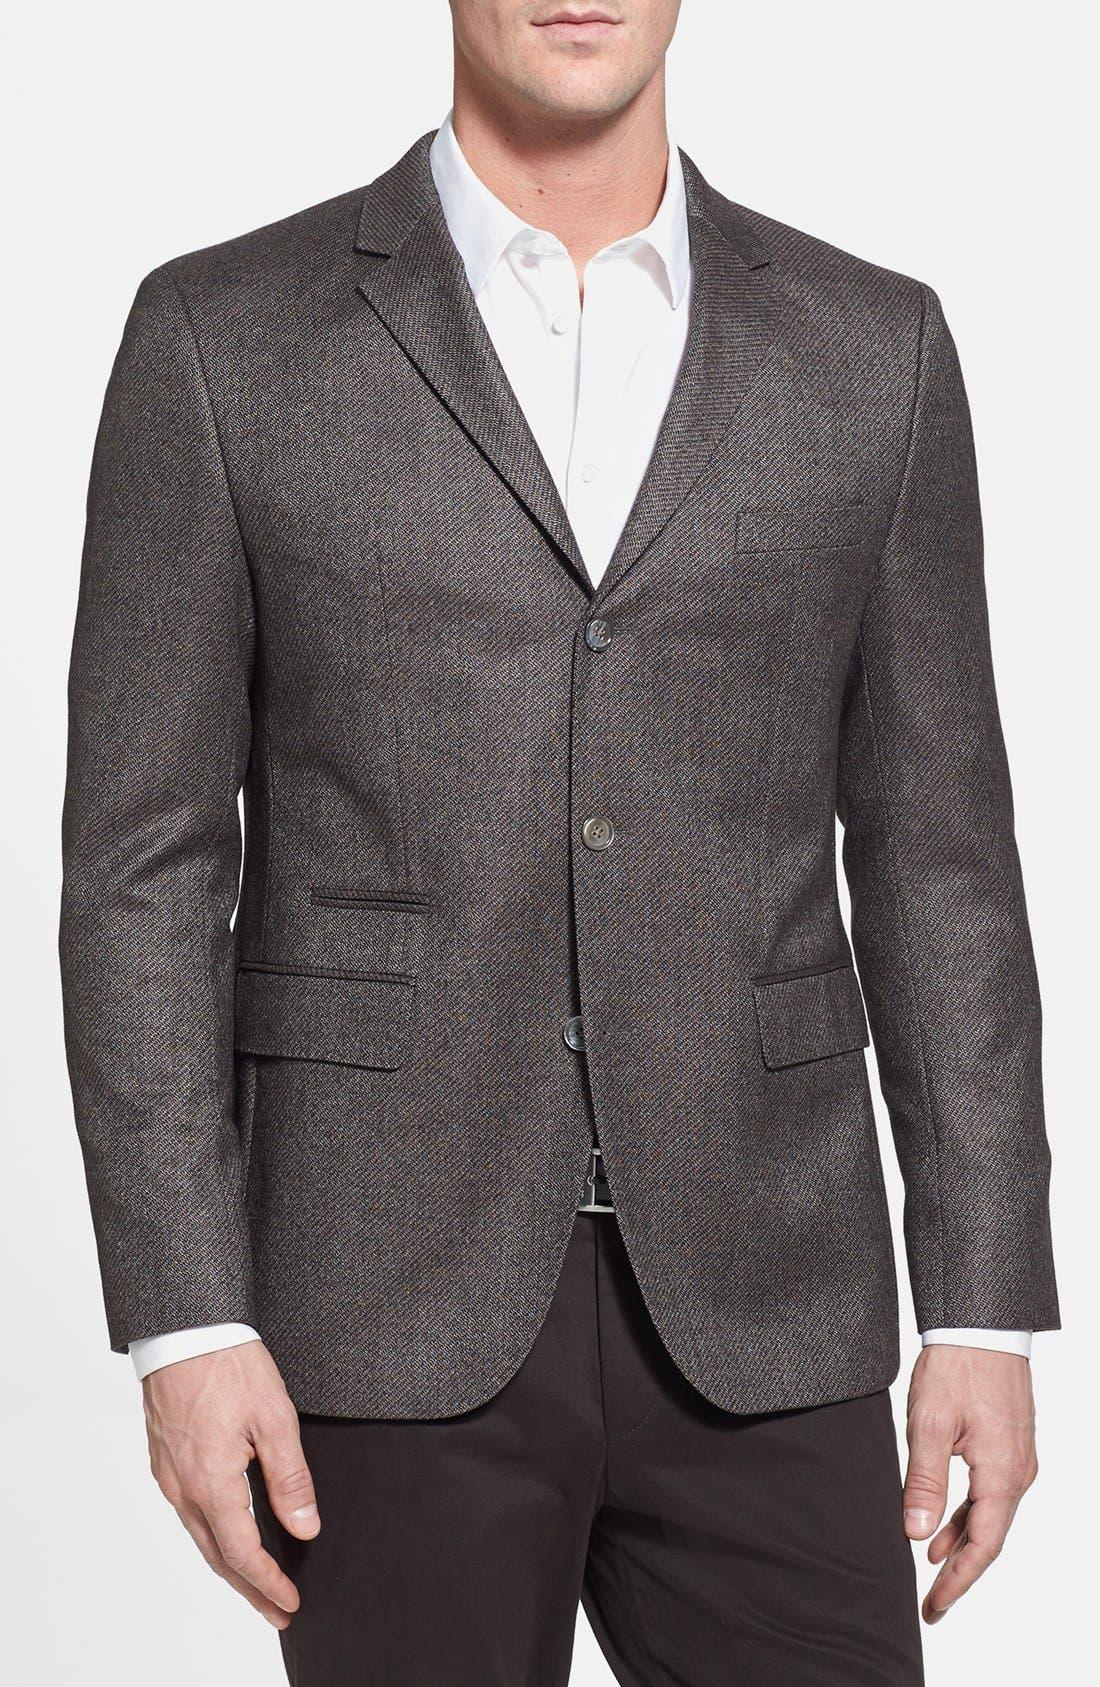 Alternate Image 1 Selected - BOSS HUGO BOSS 'Johnston' Classic Fit Three-Button Sportcoat